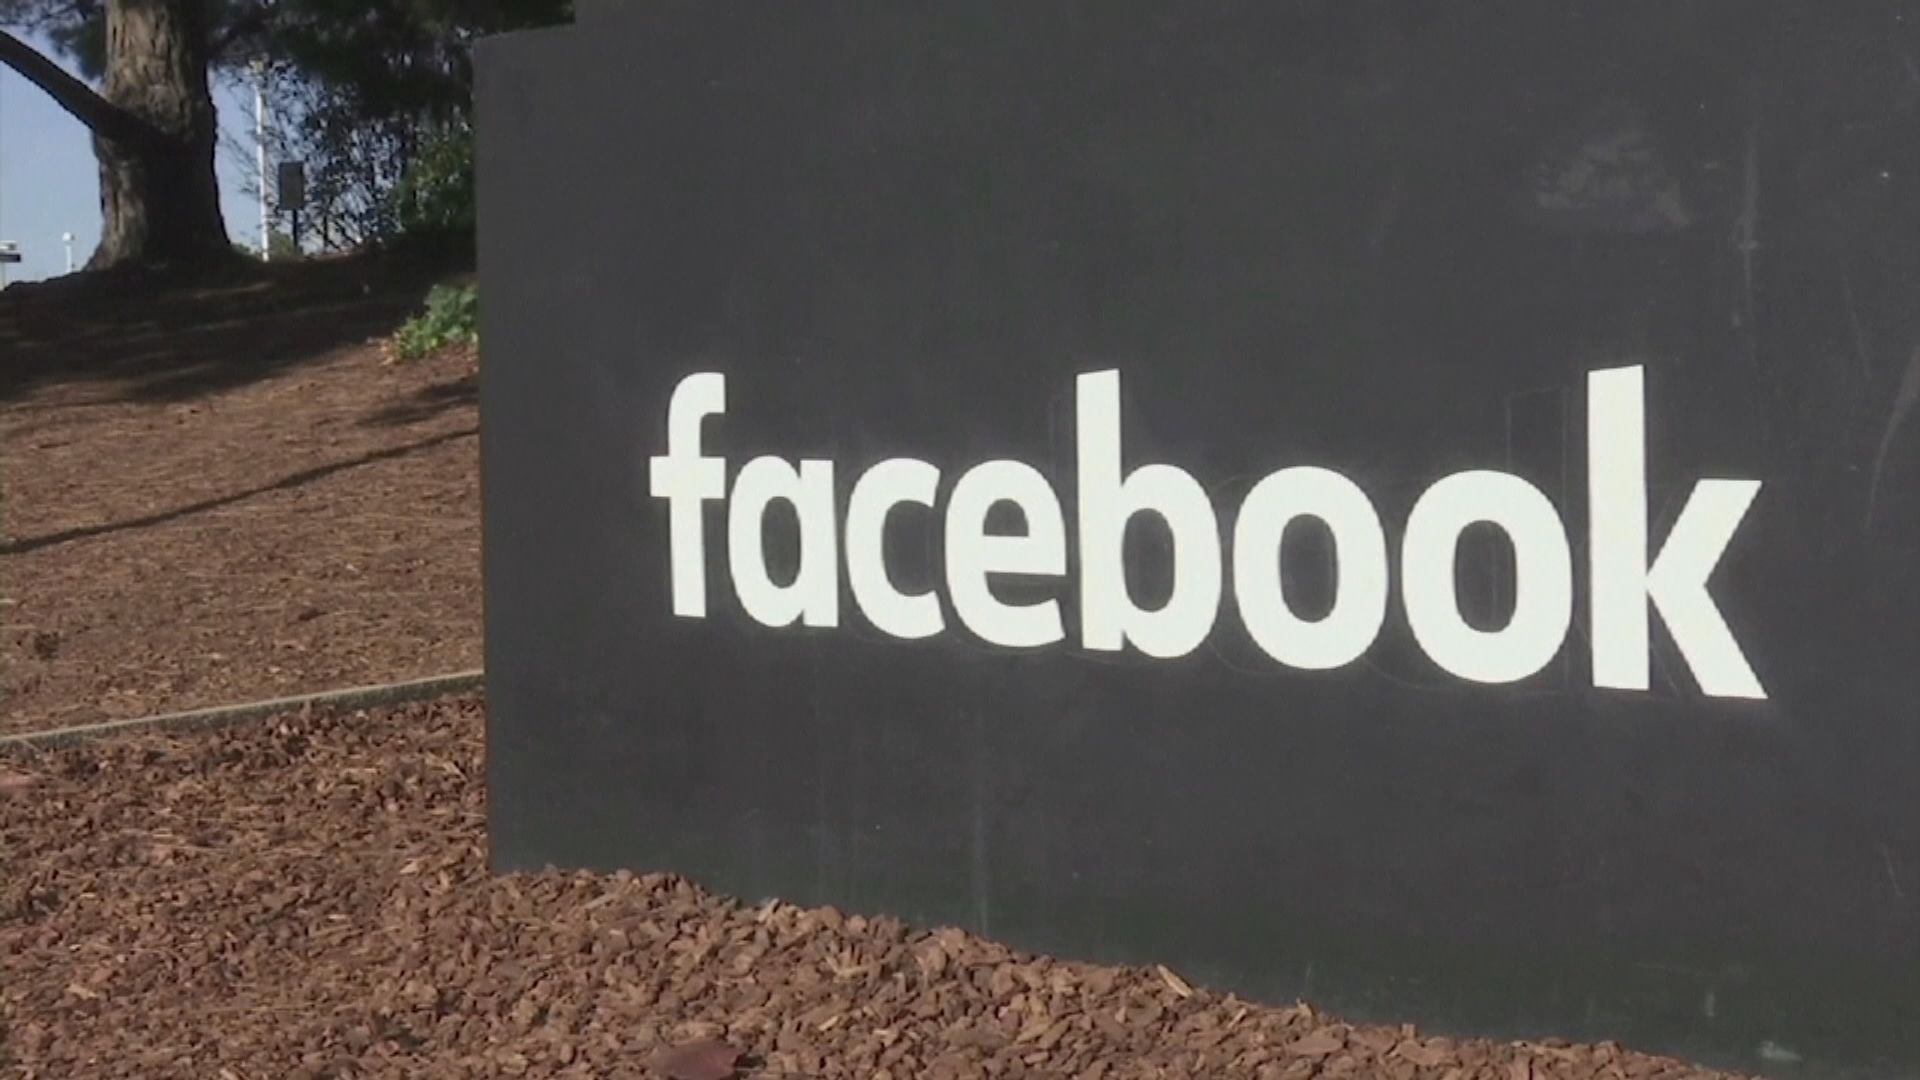 Facebook︰被制裁官員帳戶被禁用涉及支付行為